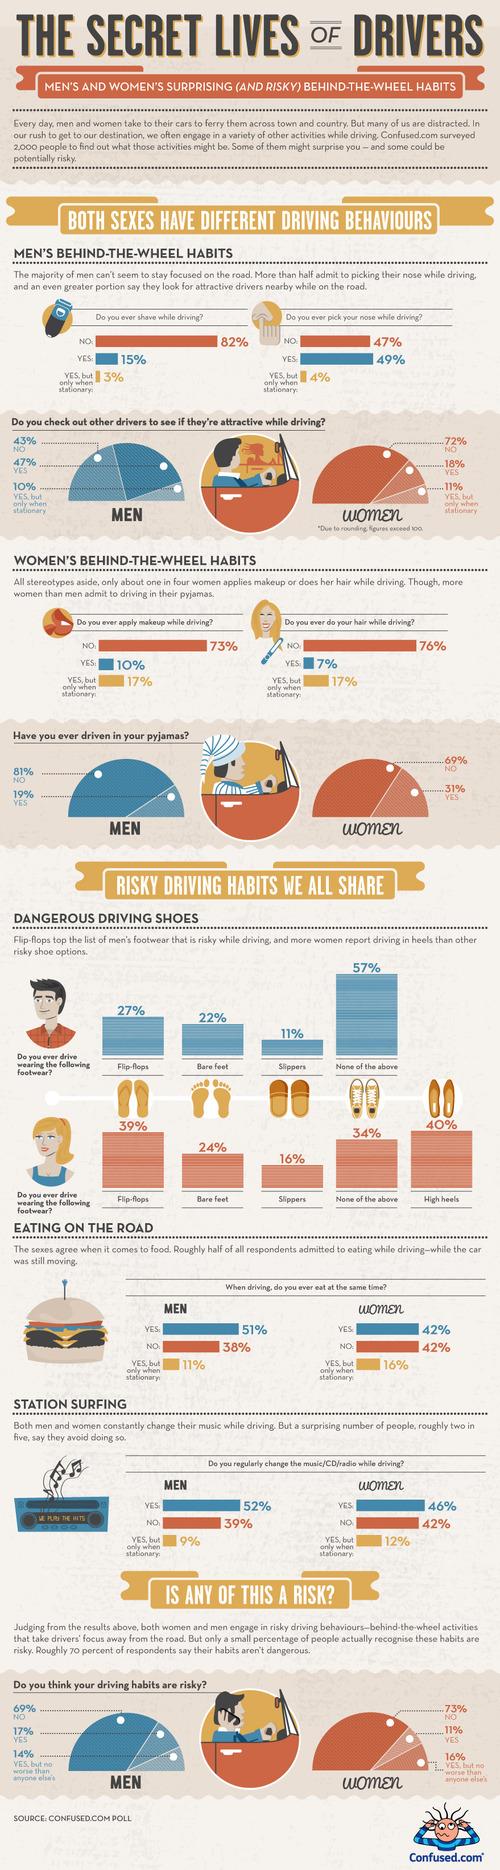 Secret-lives-of-drivers_-_bad_driving_habits